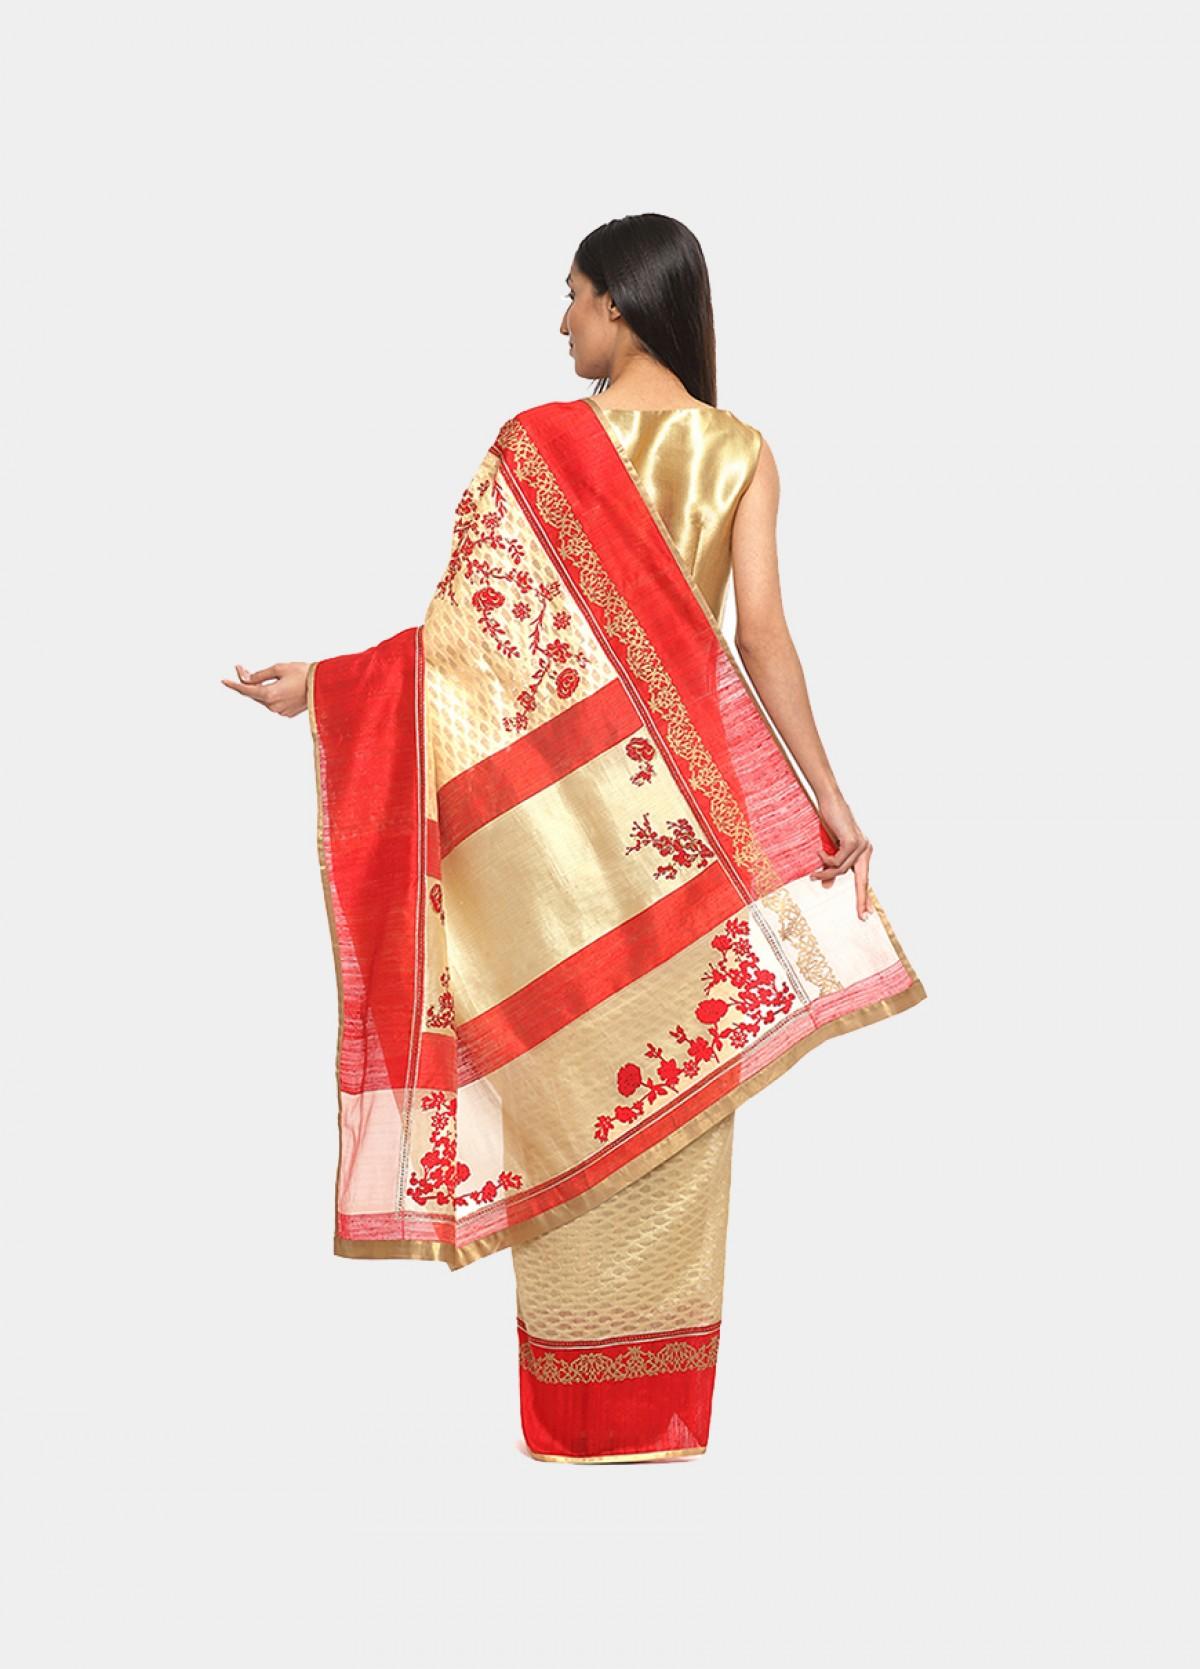 The Silk Cream Embroidered Sari